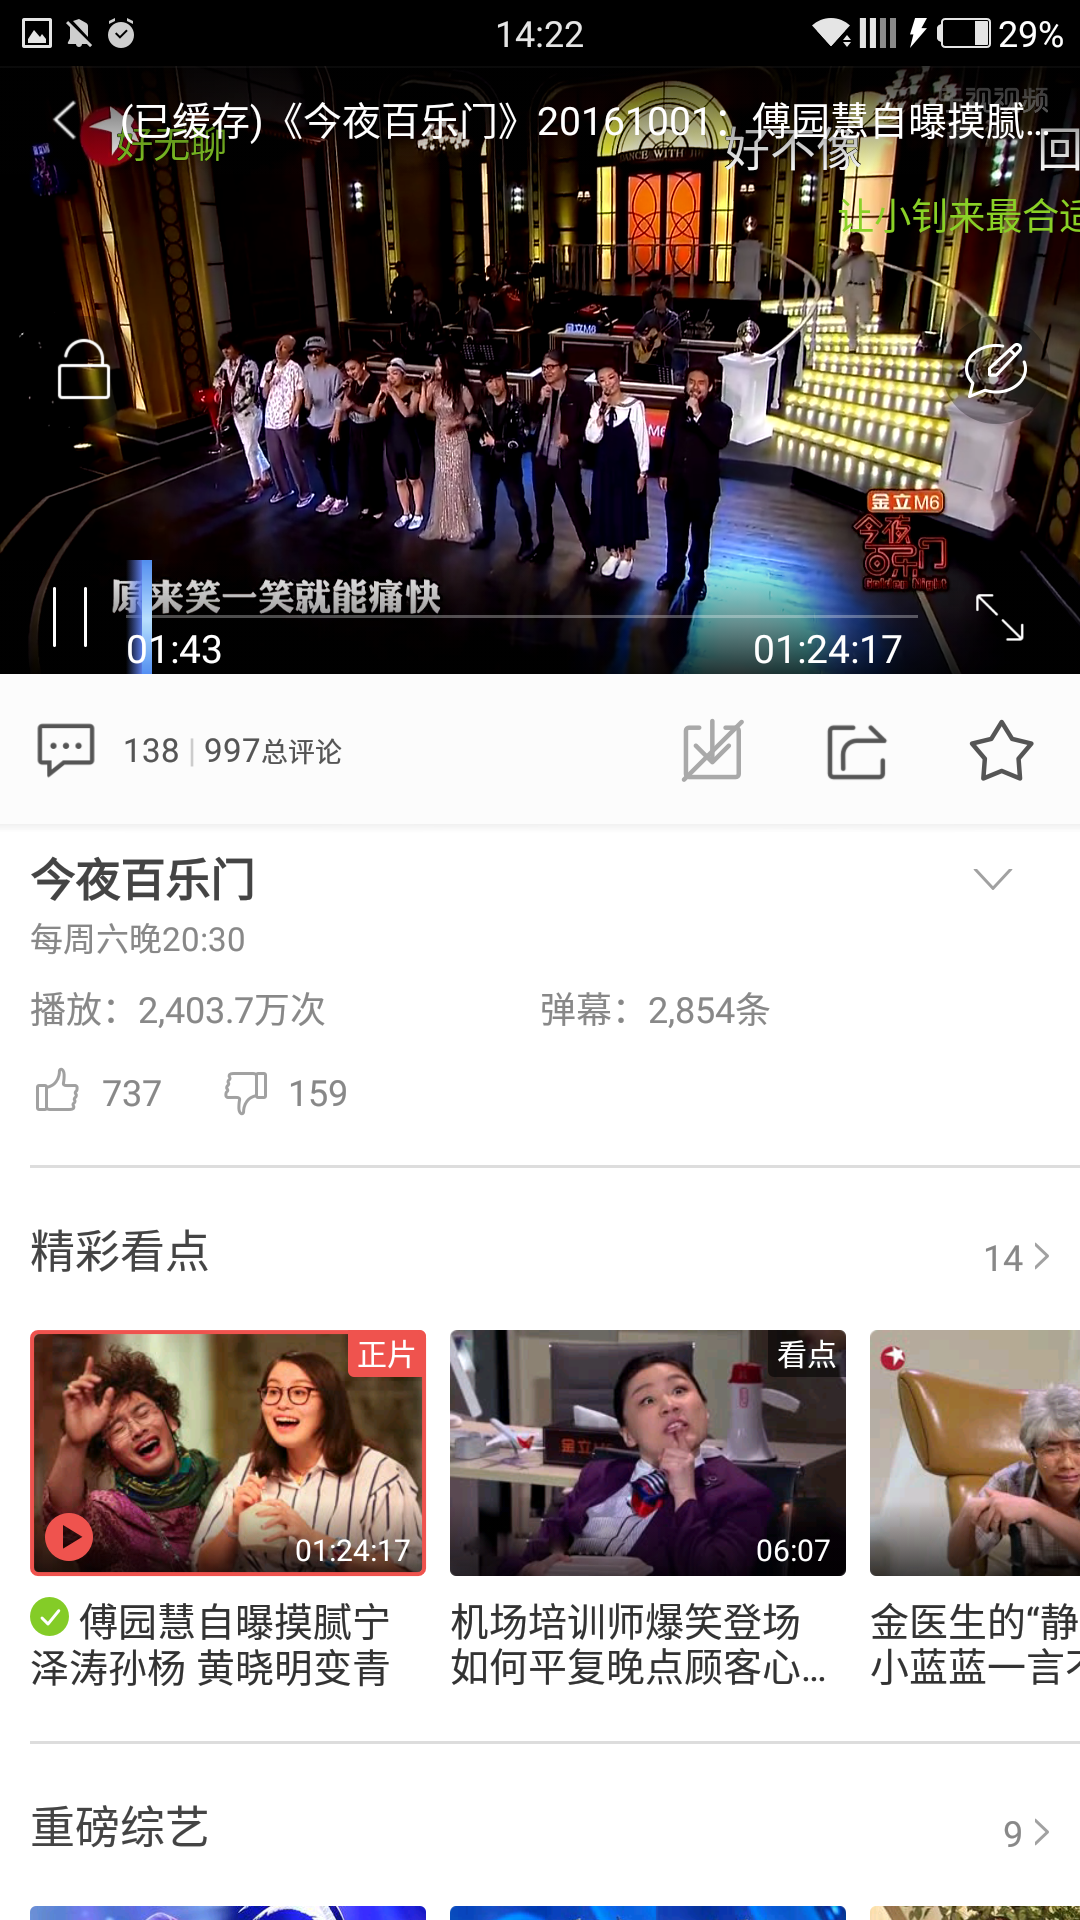 Screenshot_20161017-142211.png